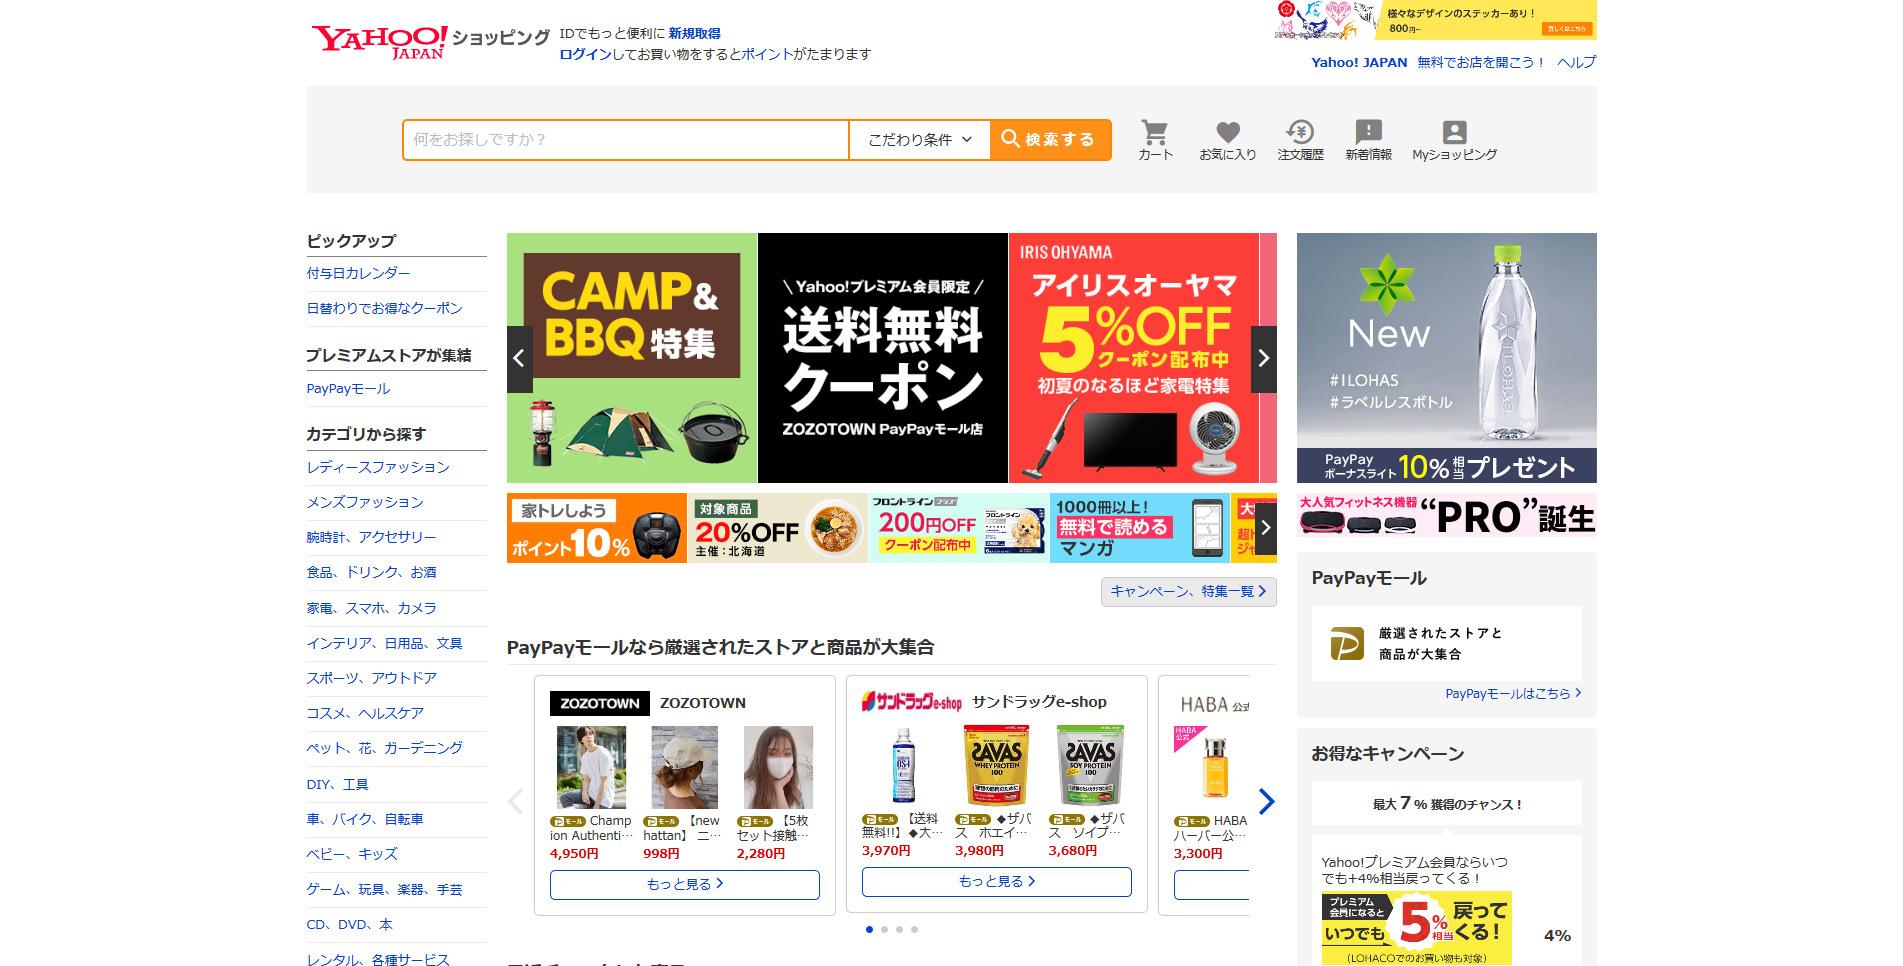 Yahoo!ショッピング公式サイト